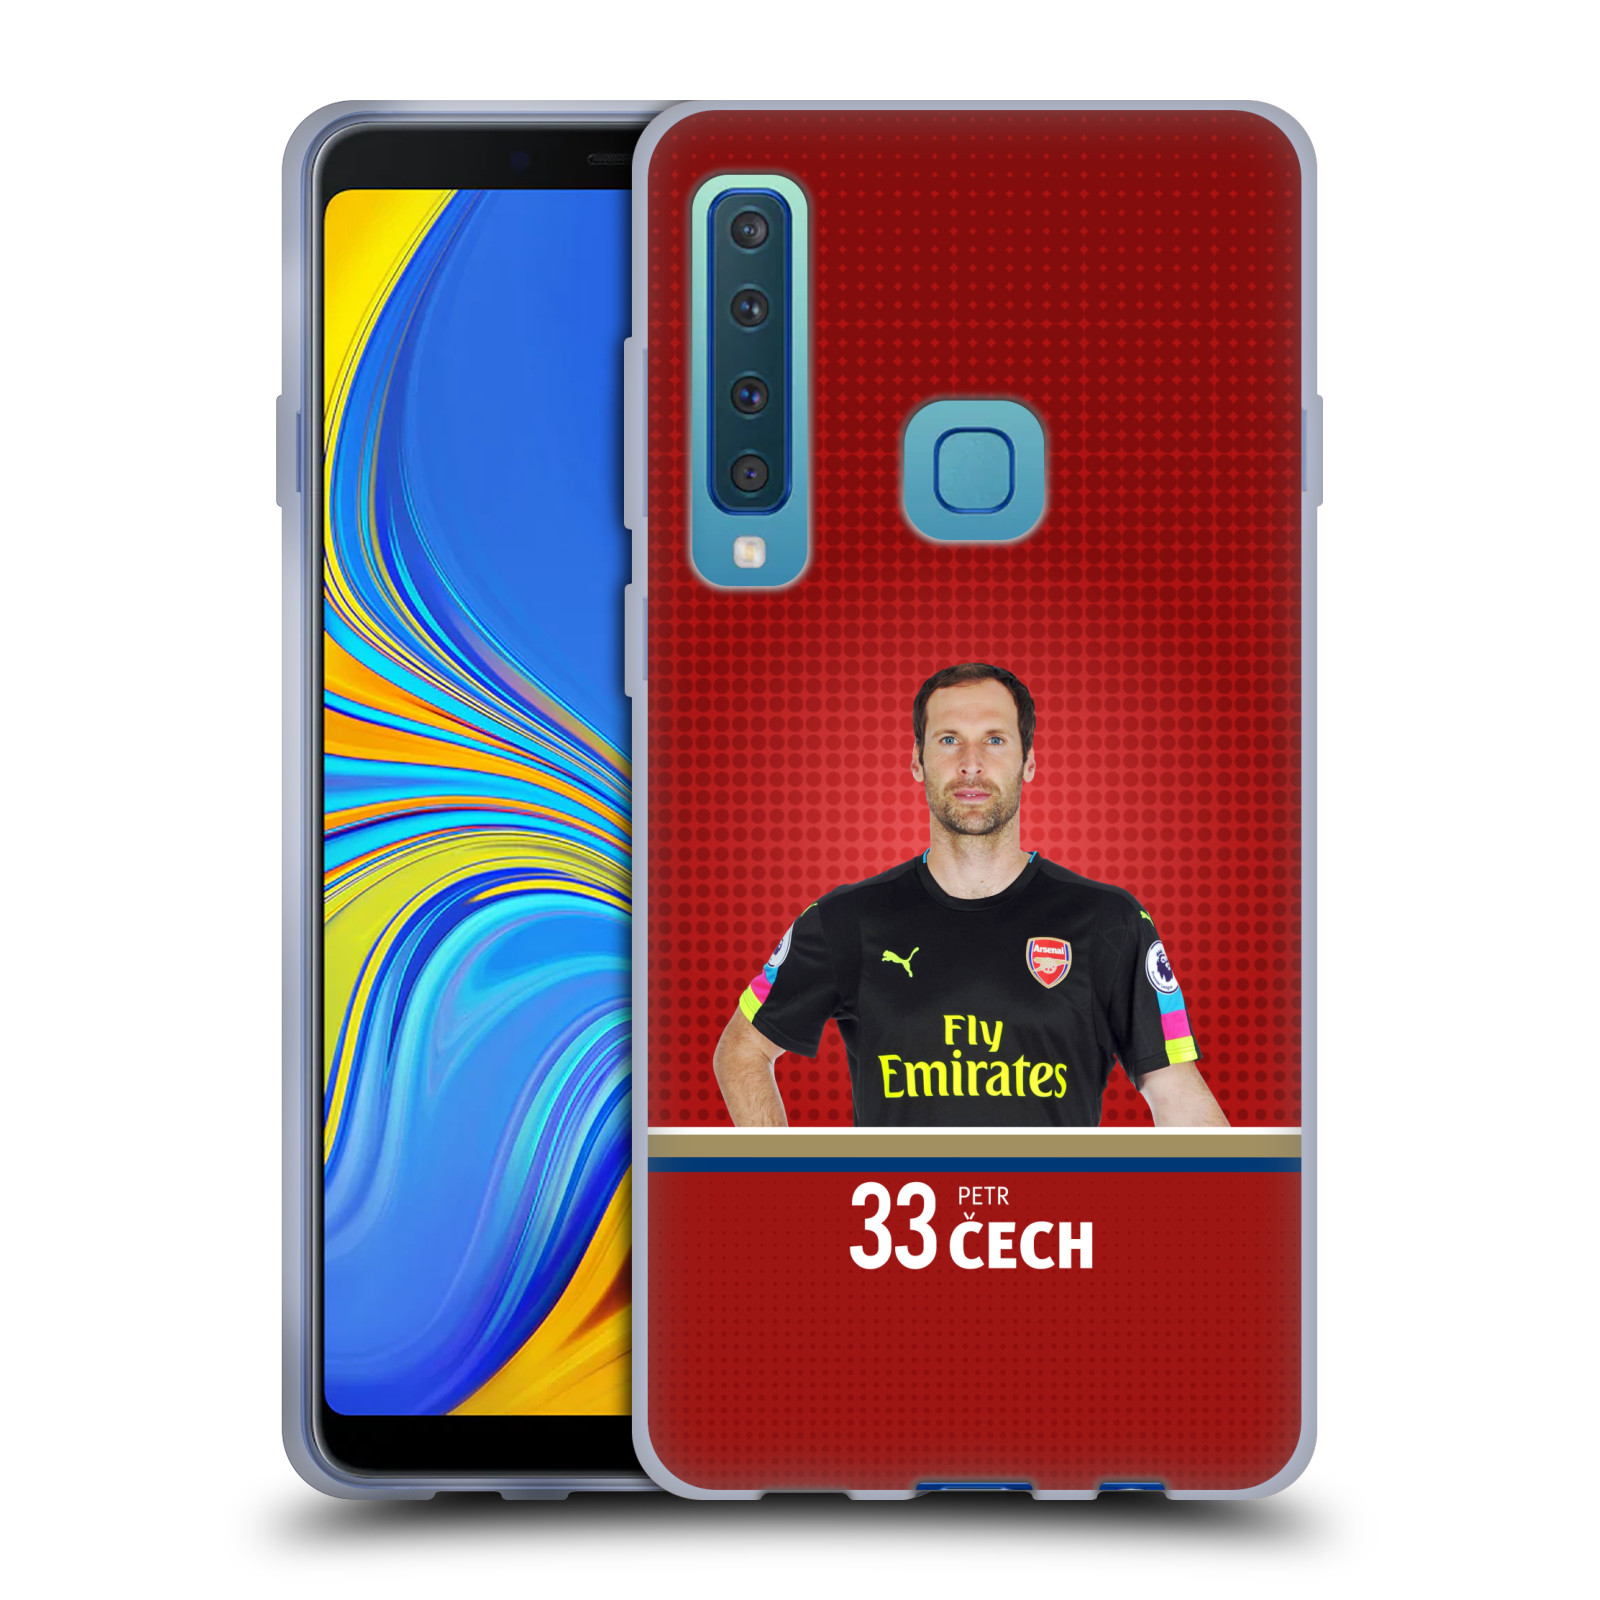 Silikonové pouzdro na mobil Samsung Galaxy A9 (2018) - Head Case - Arsenal FC - Petr Čech